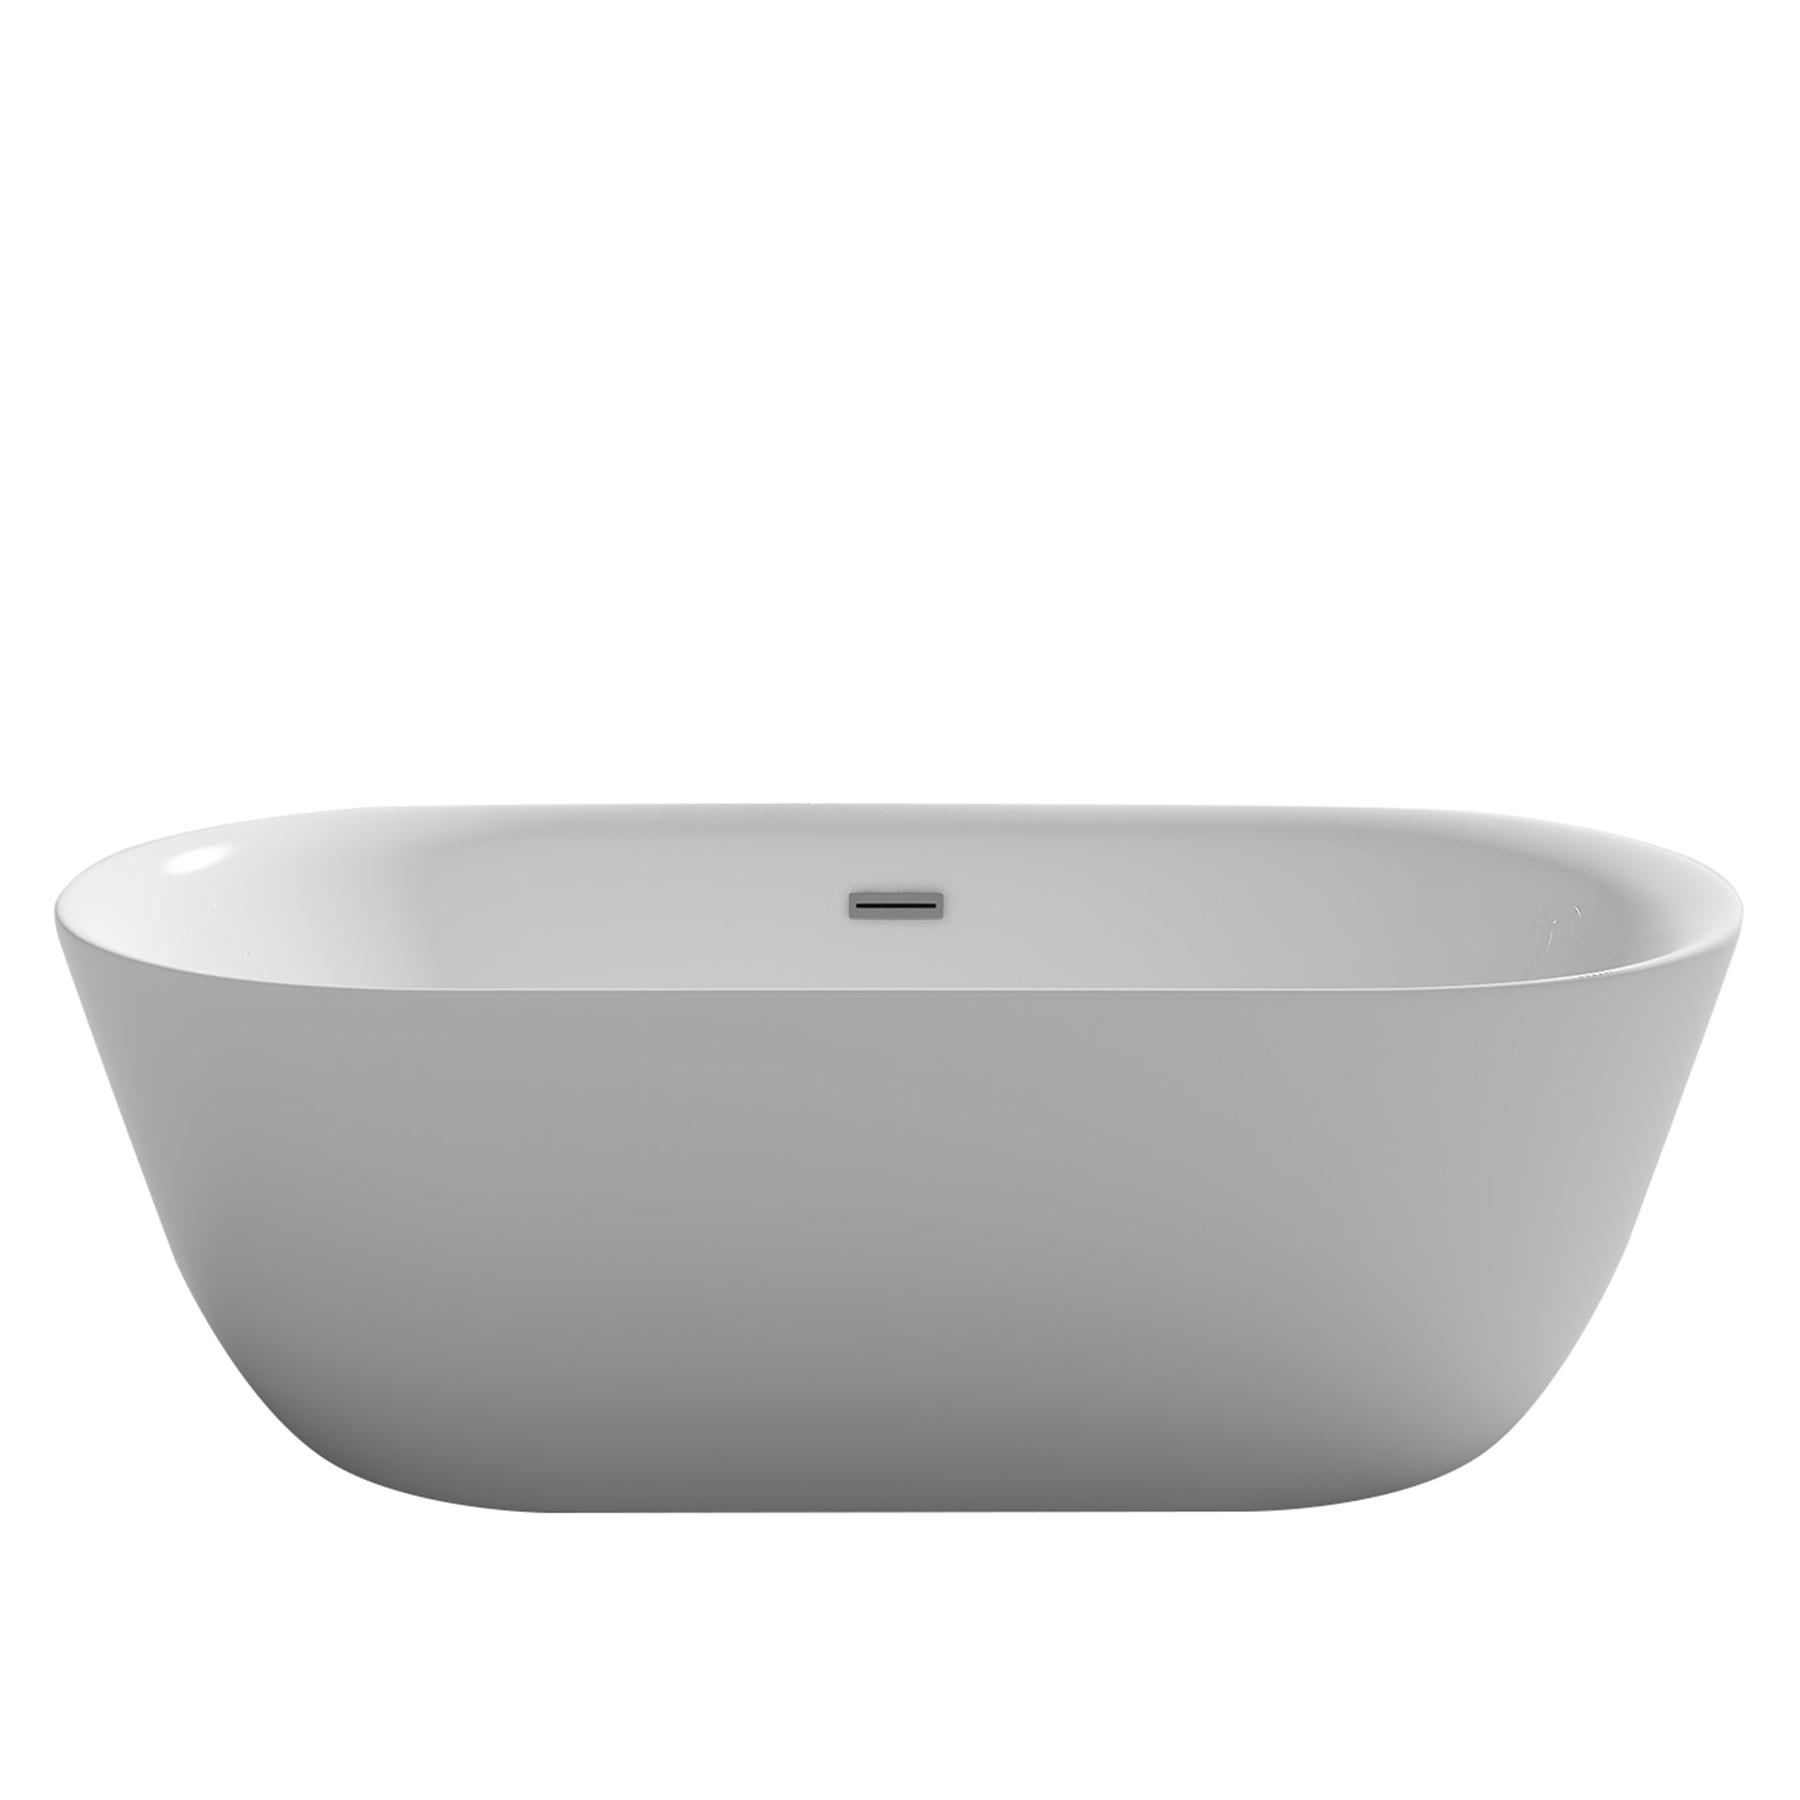 design badewanne lausanne weiss oval acryl bad ausstattung sanit r wanne neu ebay. Black Bedroom Furniture Sets. Home Design Ideas